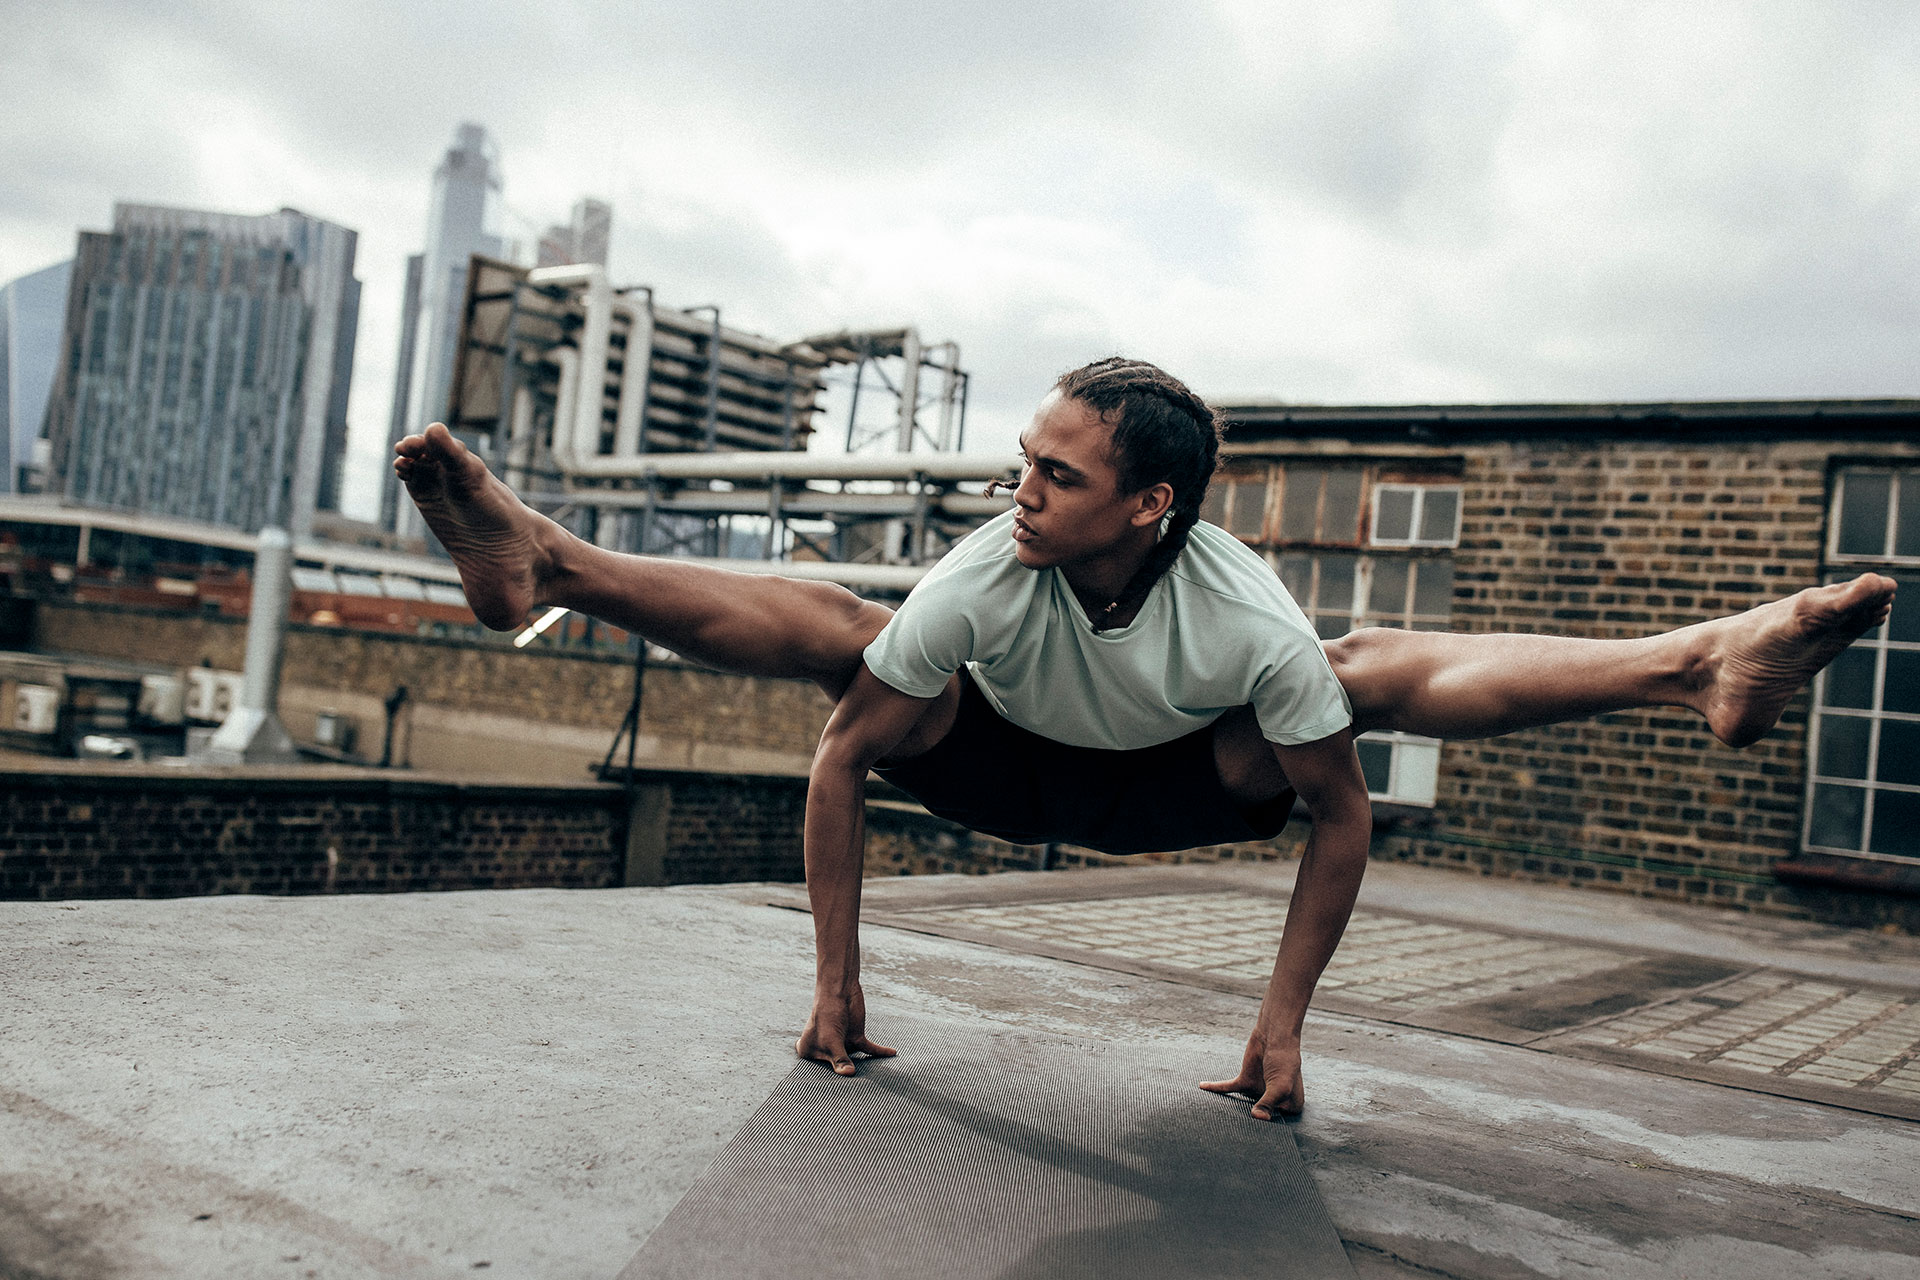 Fotograf Michael Müller Superdry Kampagne People Lifestyle Yoga England